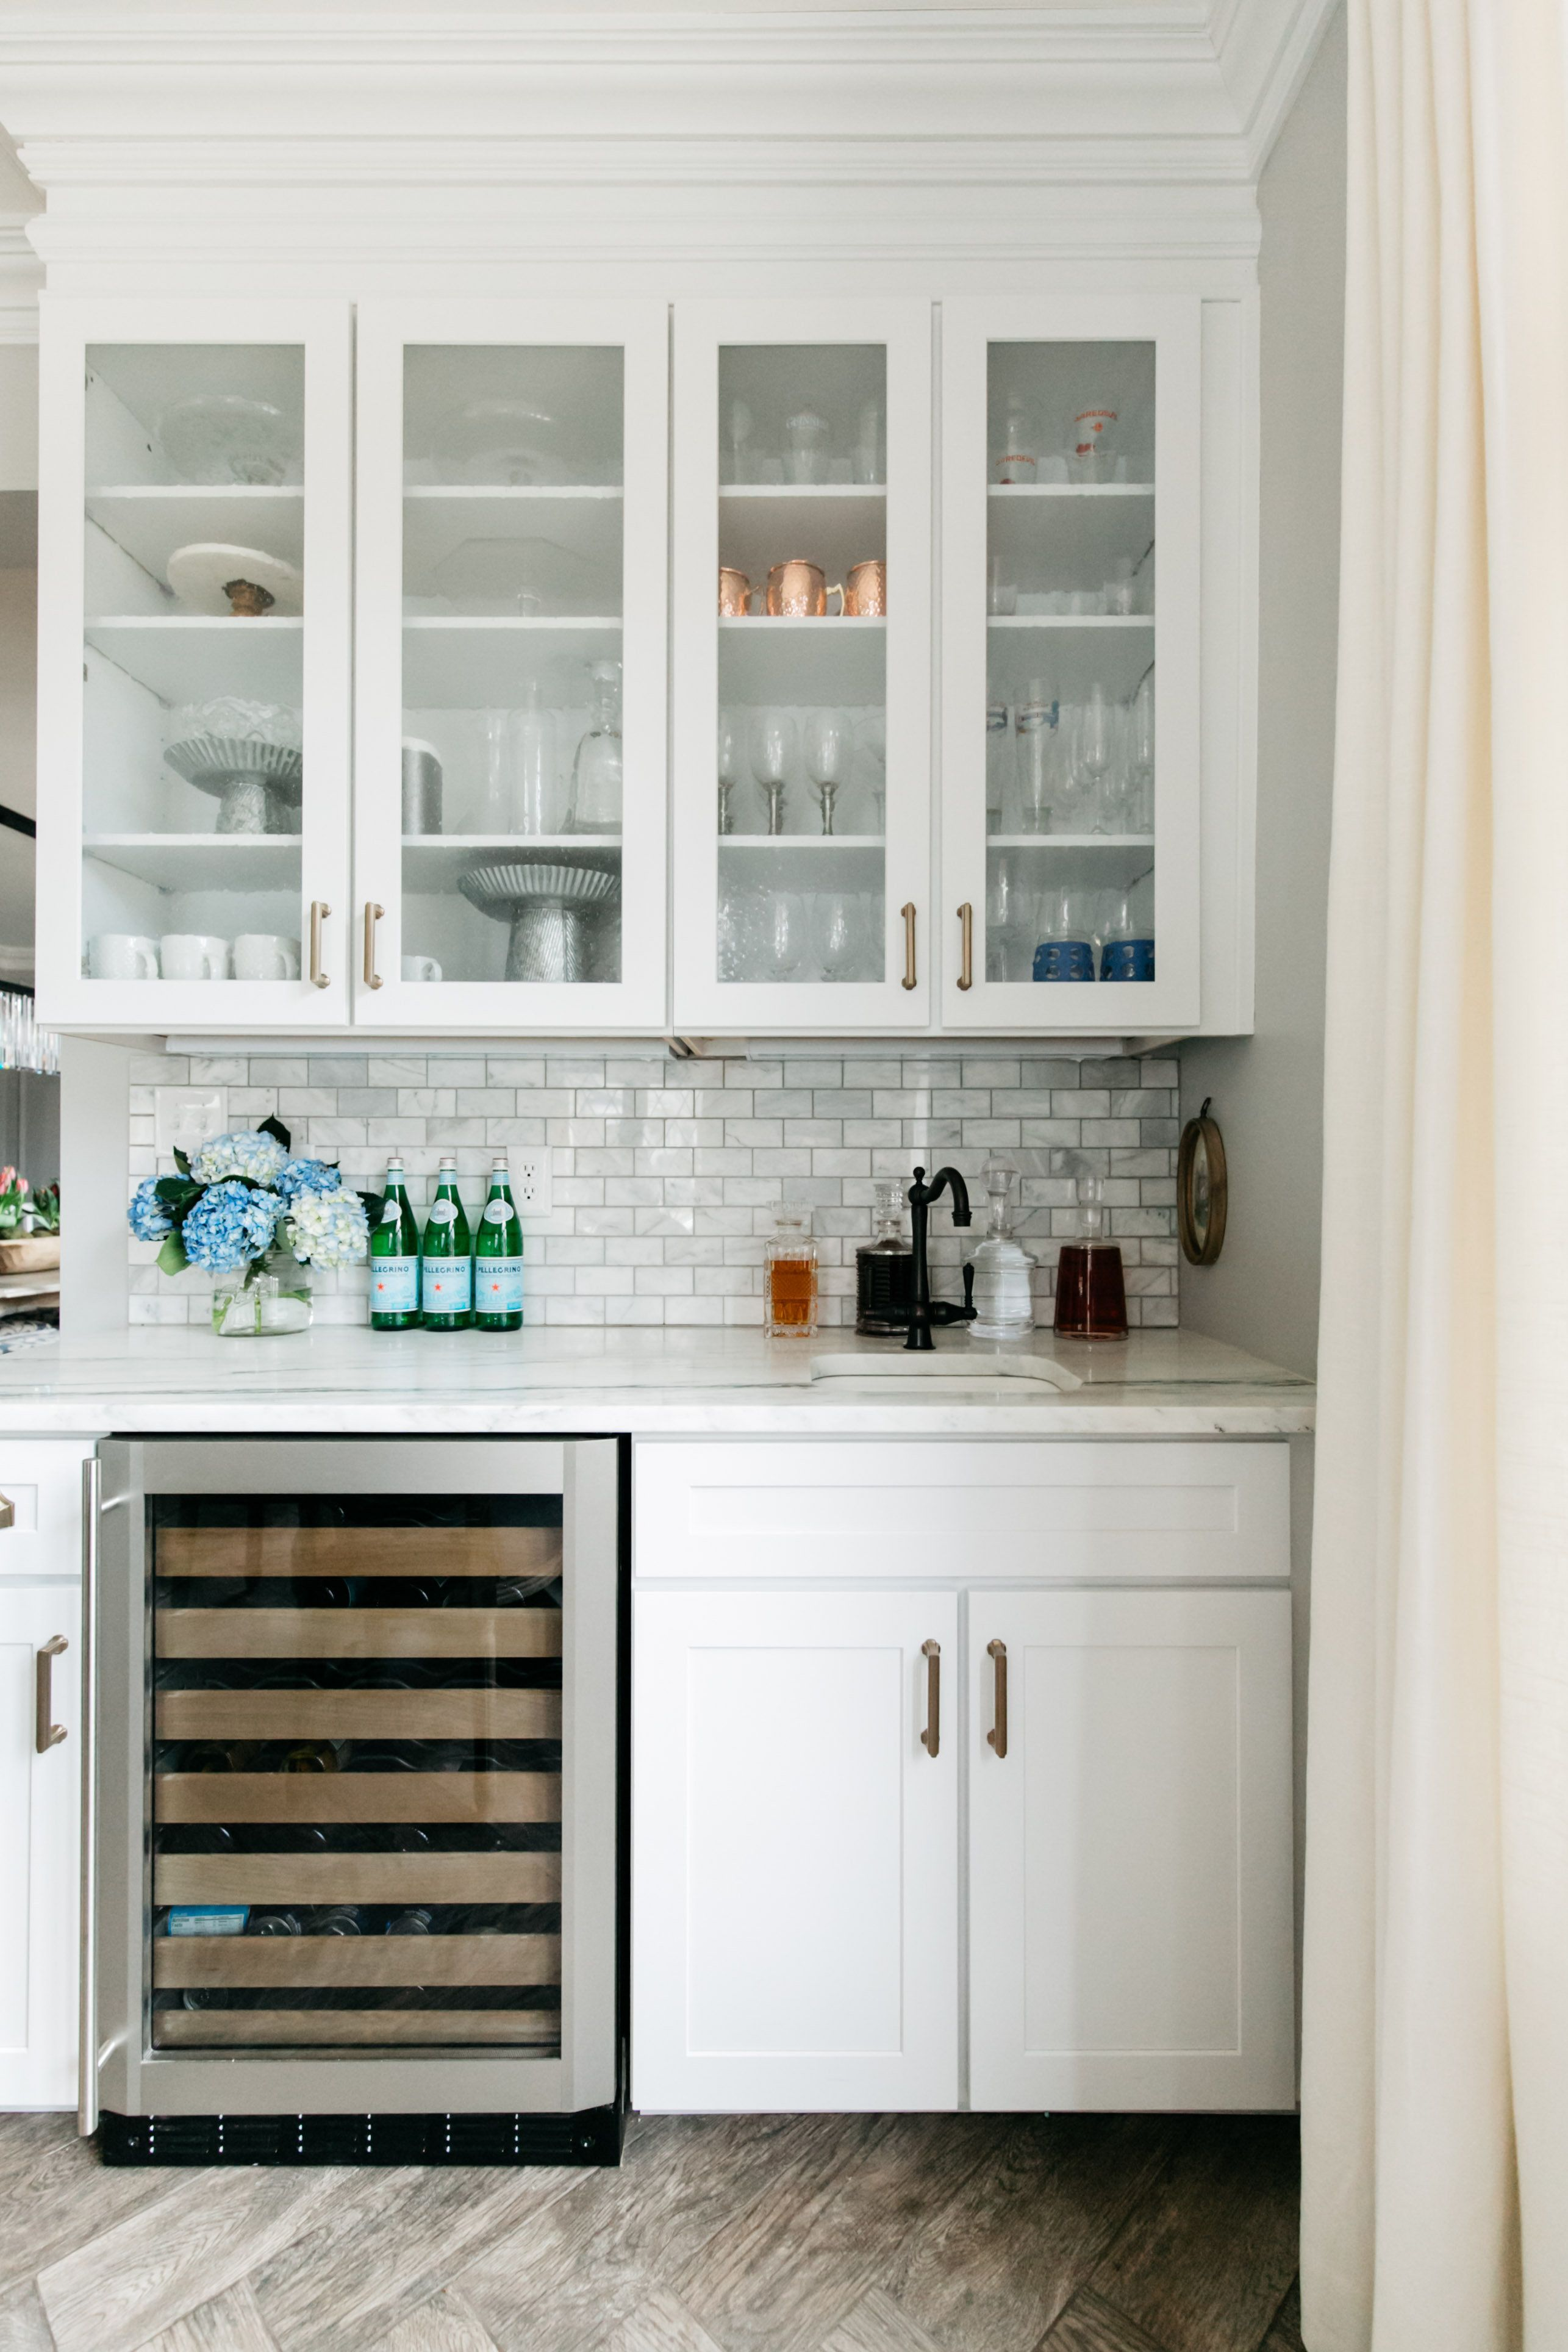 Pin By Tiffany Skilling Interiors On Kitchens Redo Kitchen Cabinets Redo Cabinets Interior